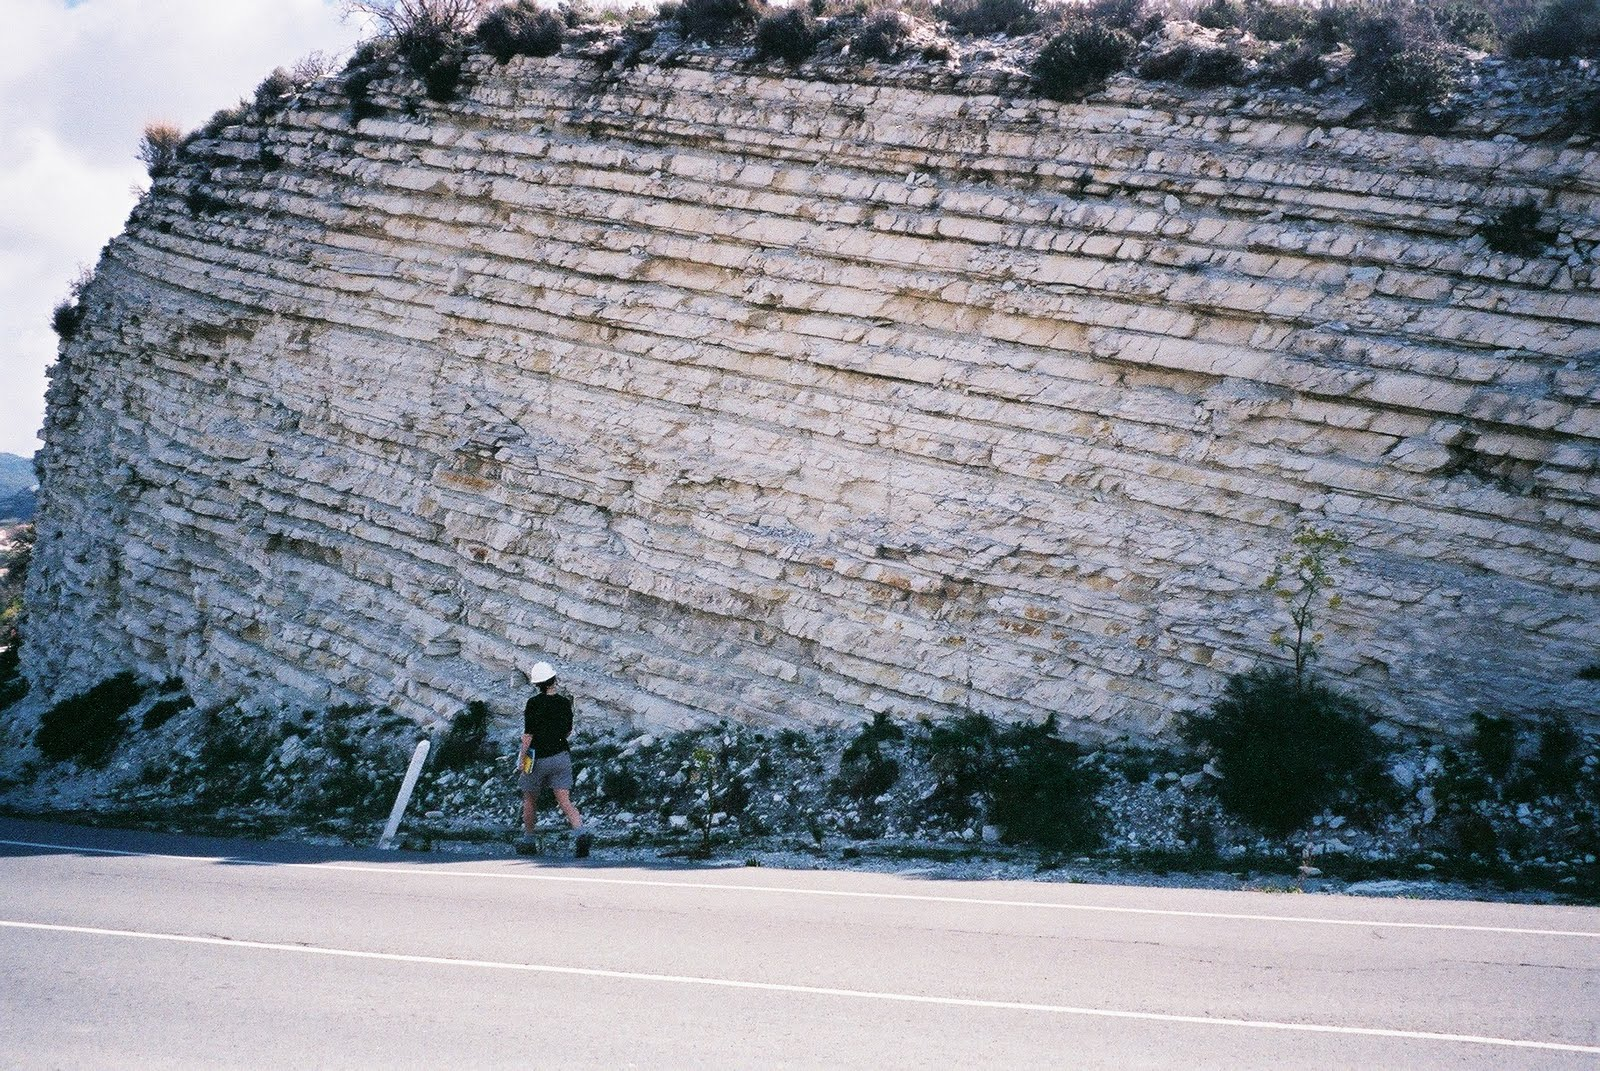 http://3.bp.blogspot.com/_4zJ0xFf3DEQ/TA6ZIN7ShQI/AAAAAAAABM4/4mmxSBf8Hjc/s1600/Geology_of_Cyprus-Chalk.jpg